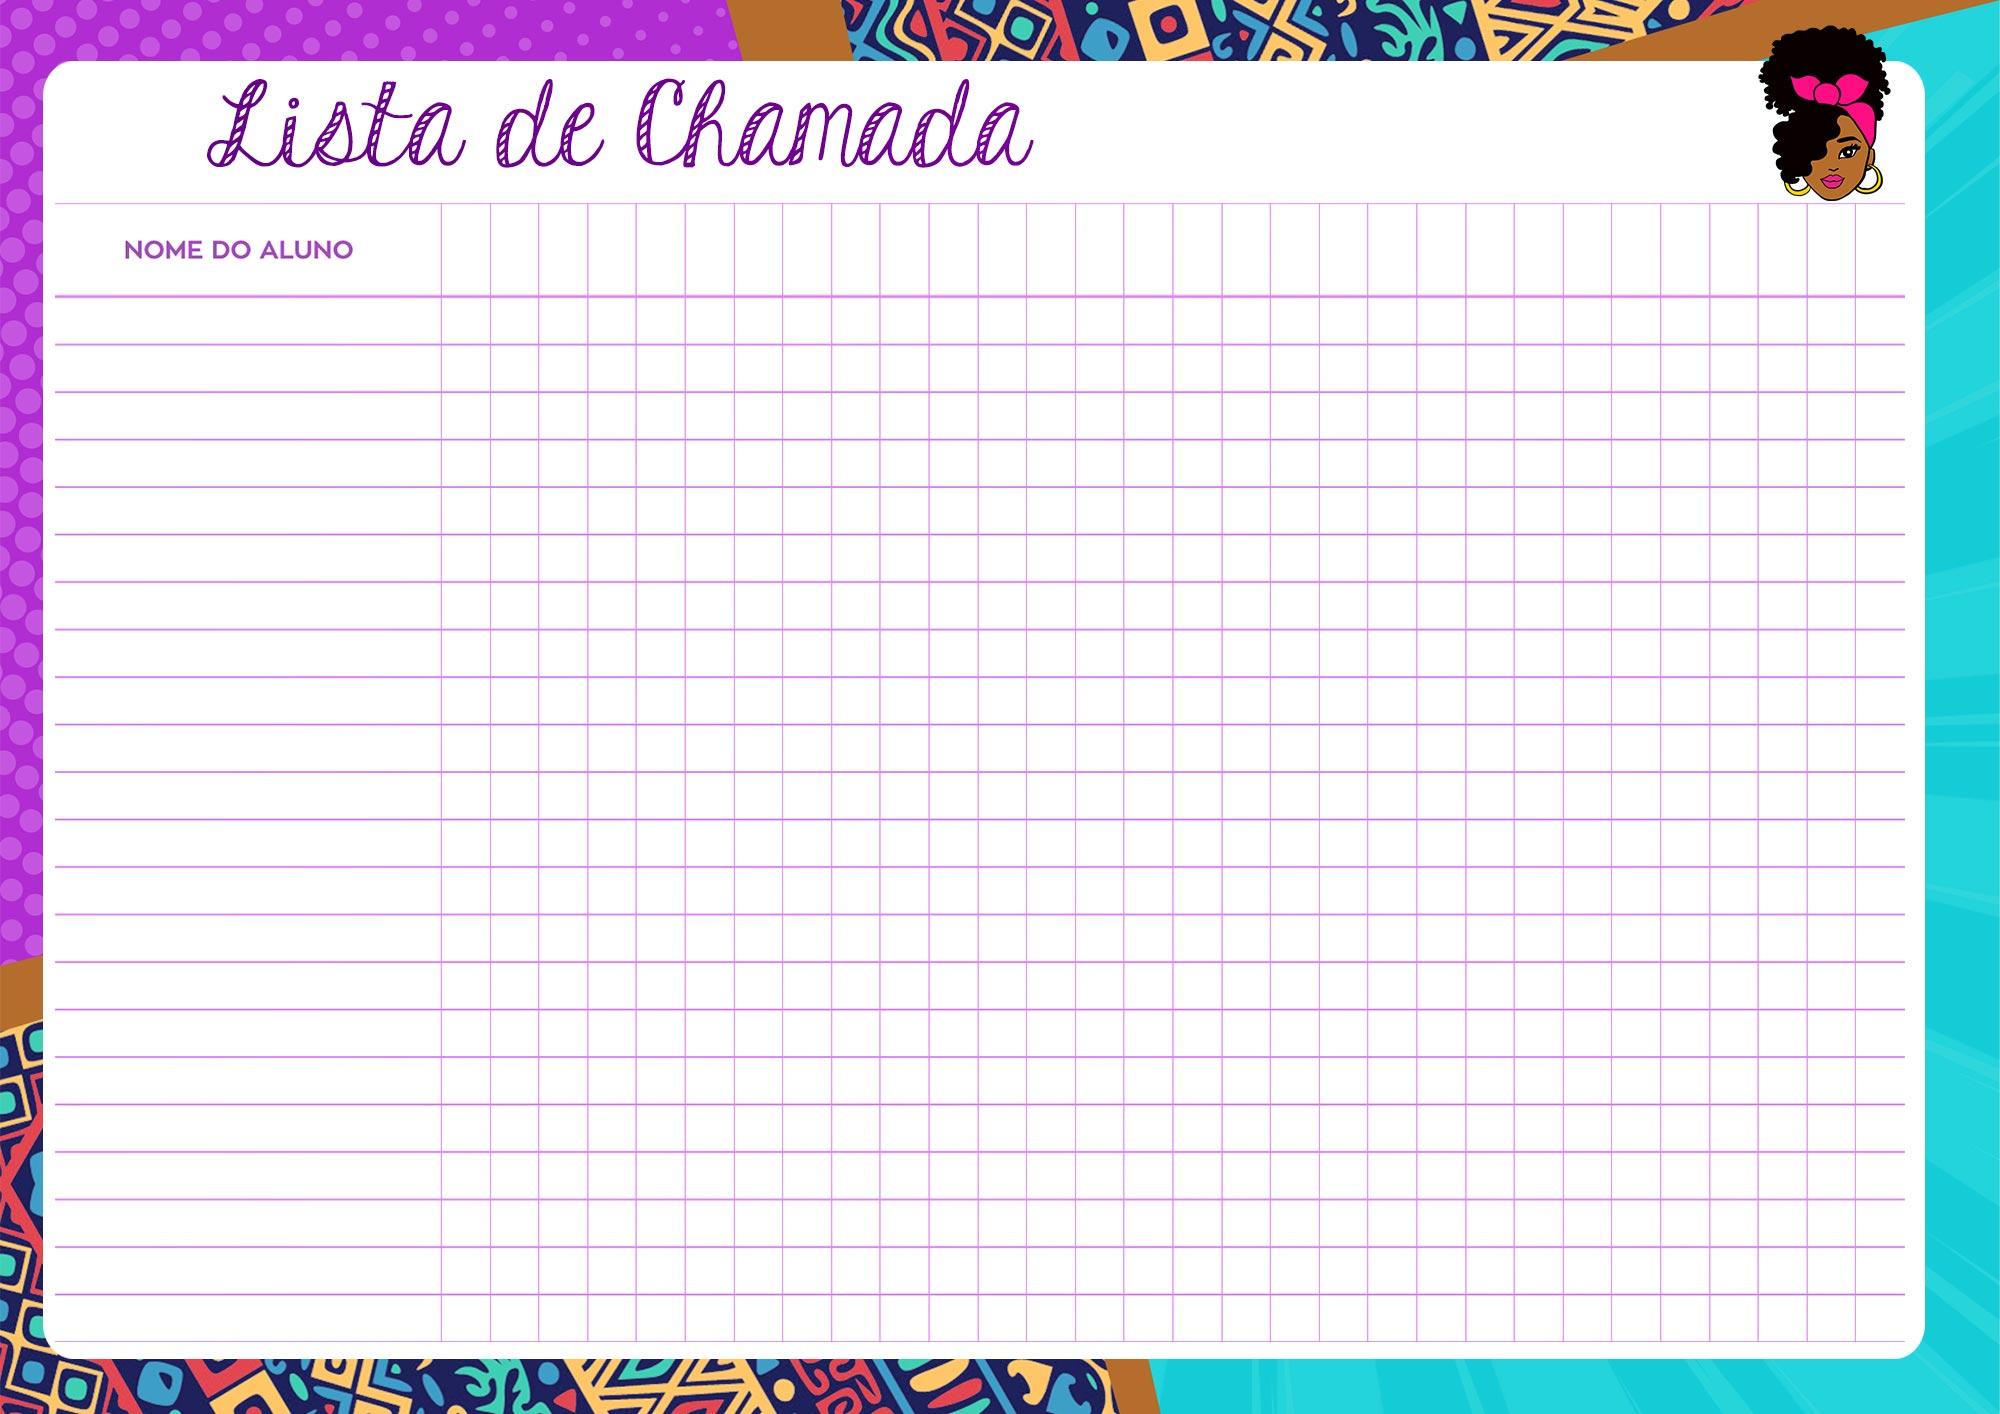 Planner Professor Mulher Afro Lista de Chamada